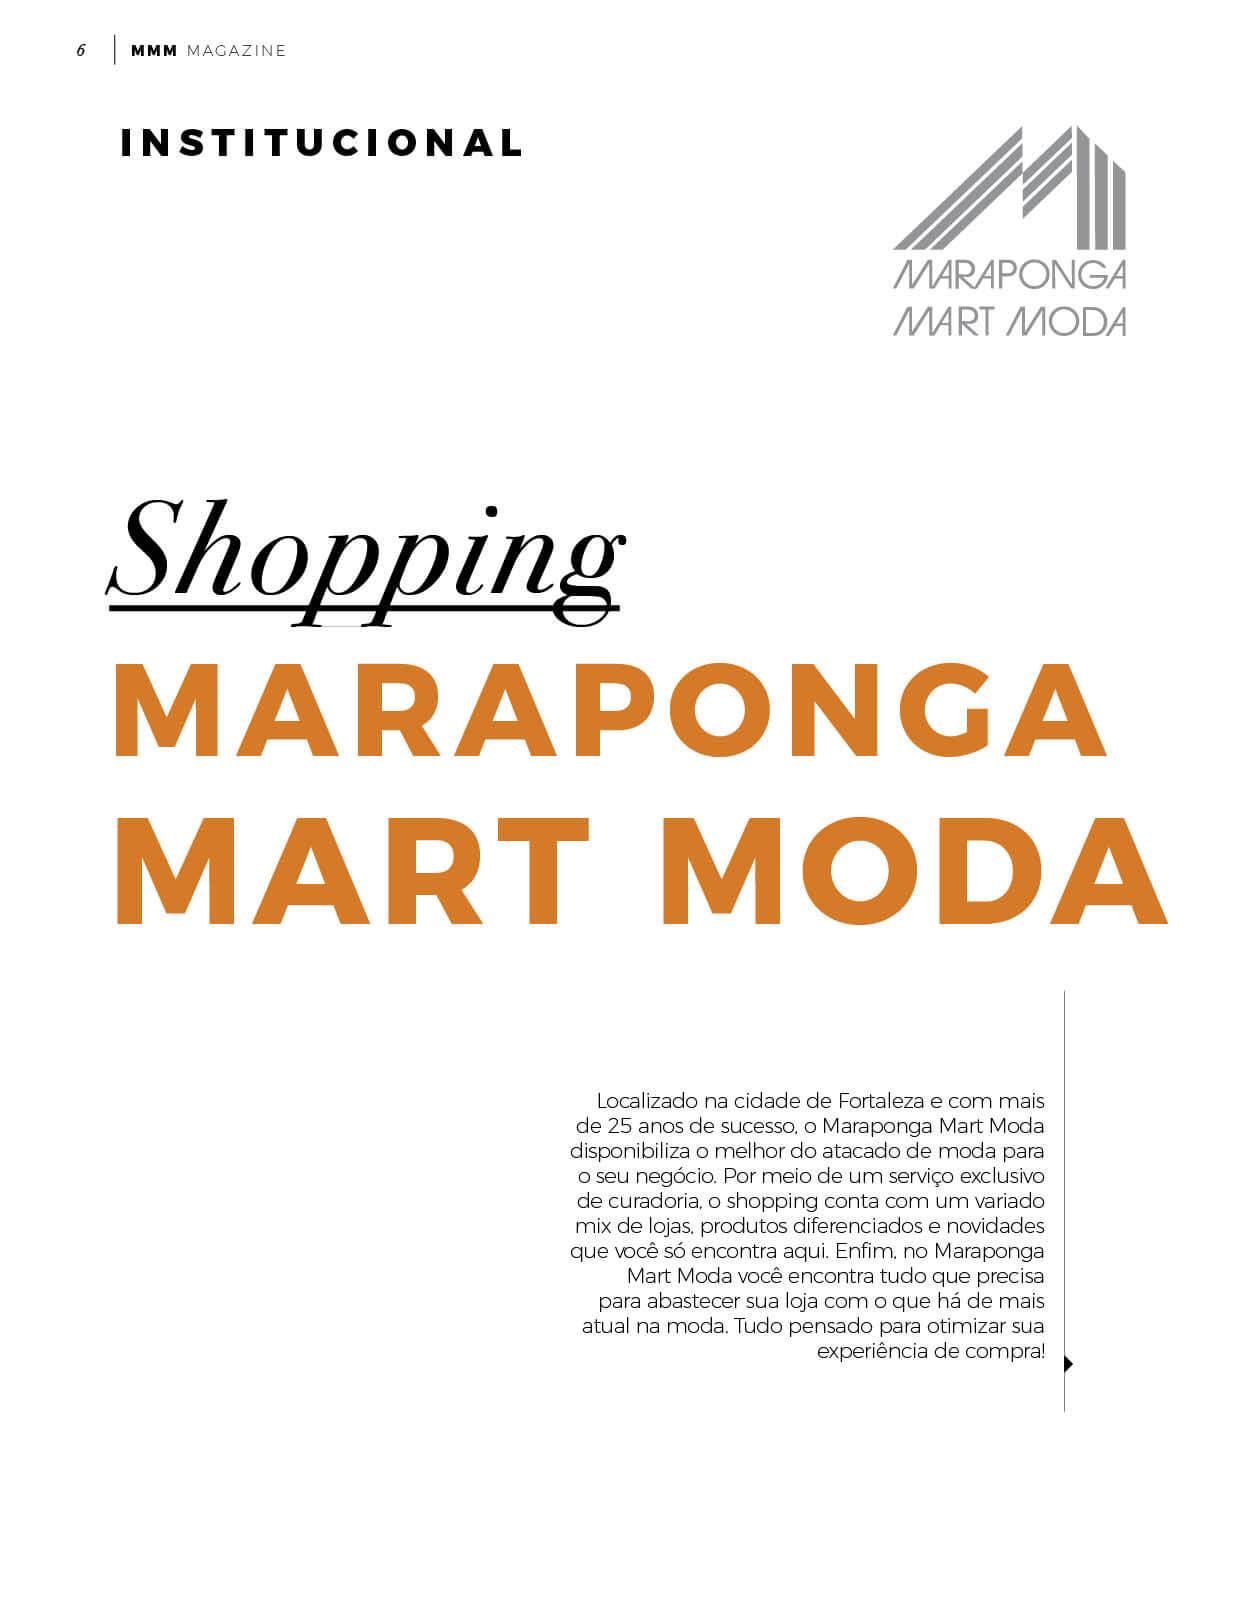 revista-mmmagazine-6